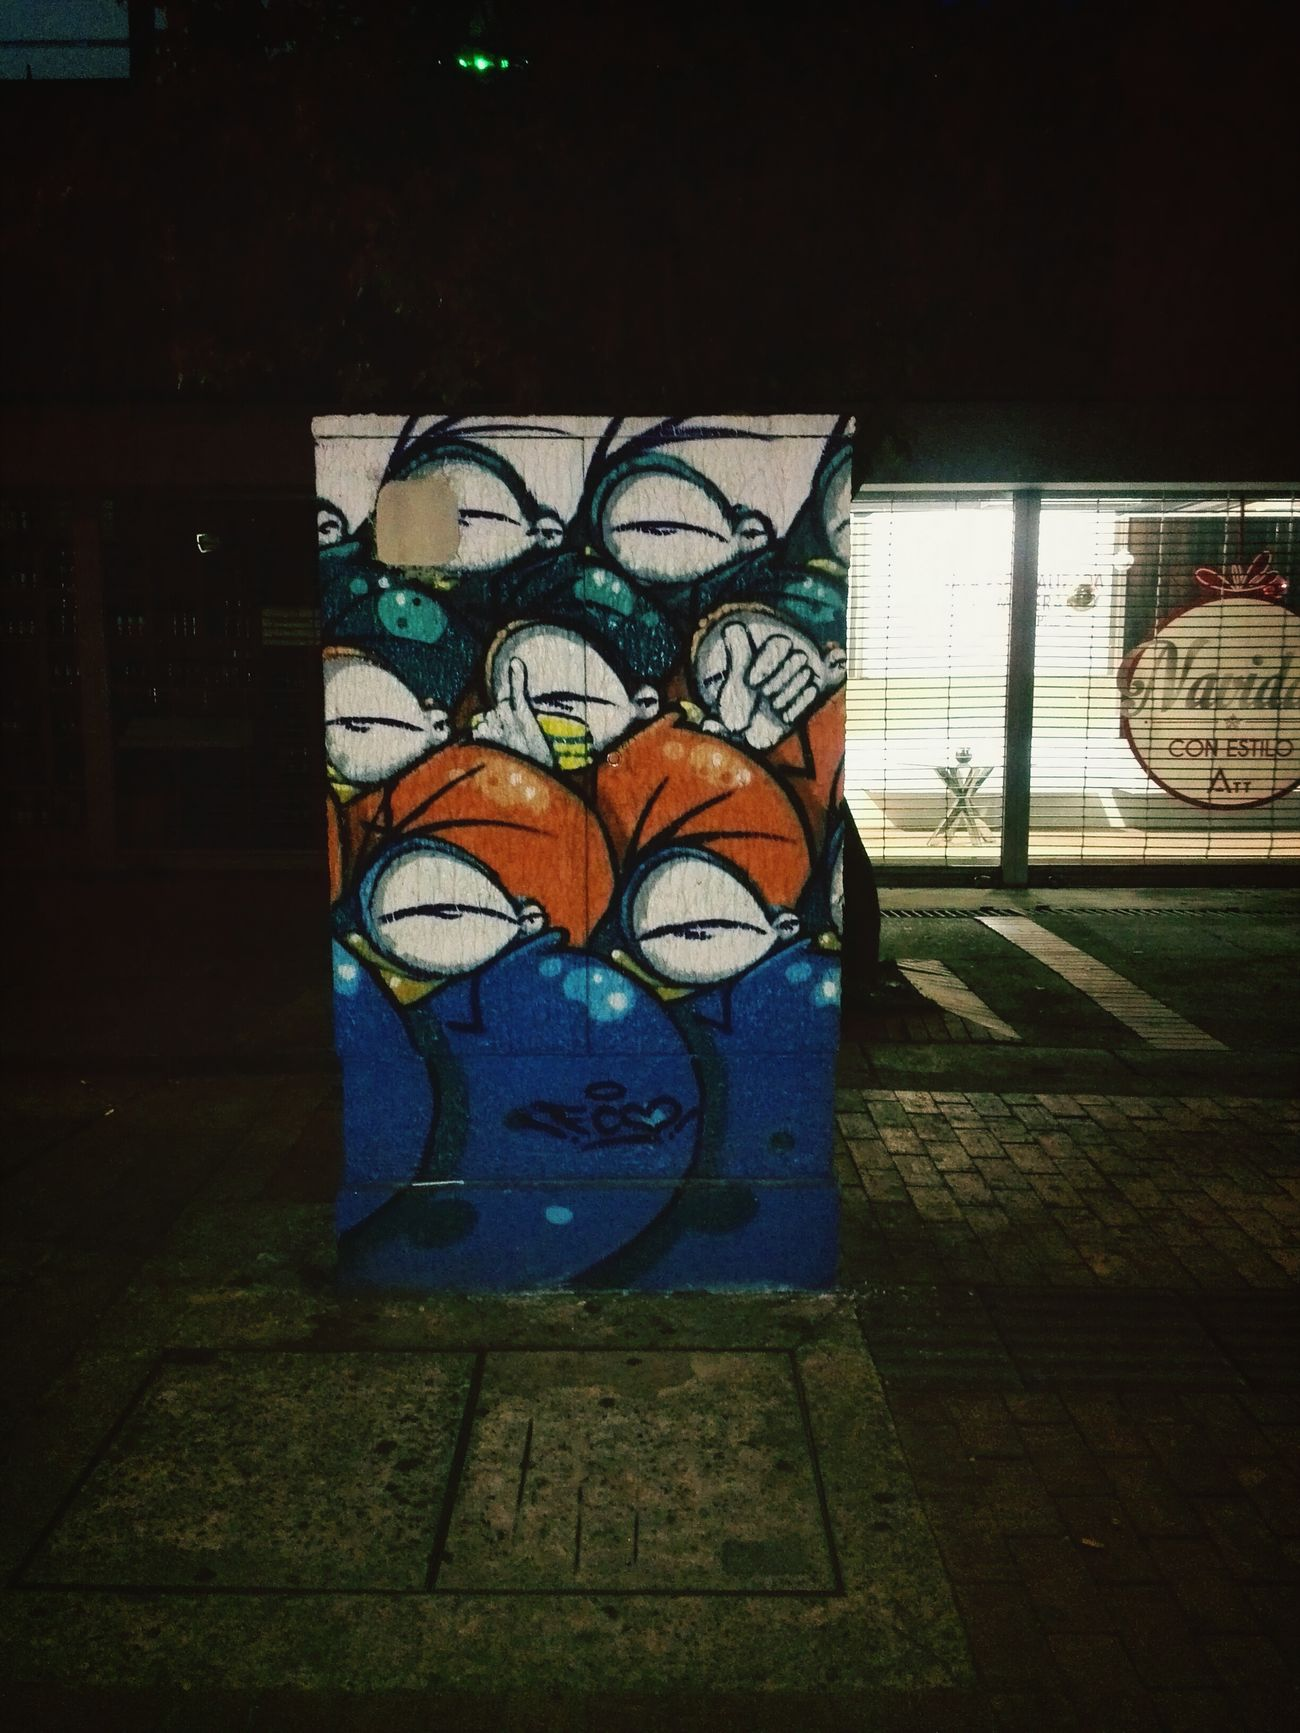 Que buena decoración para esas feas cajas telefónicas Street Street Art